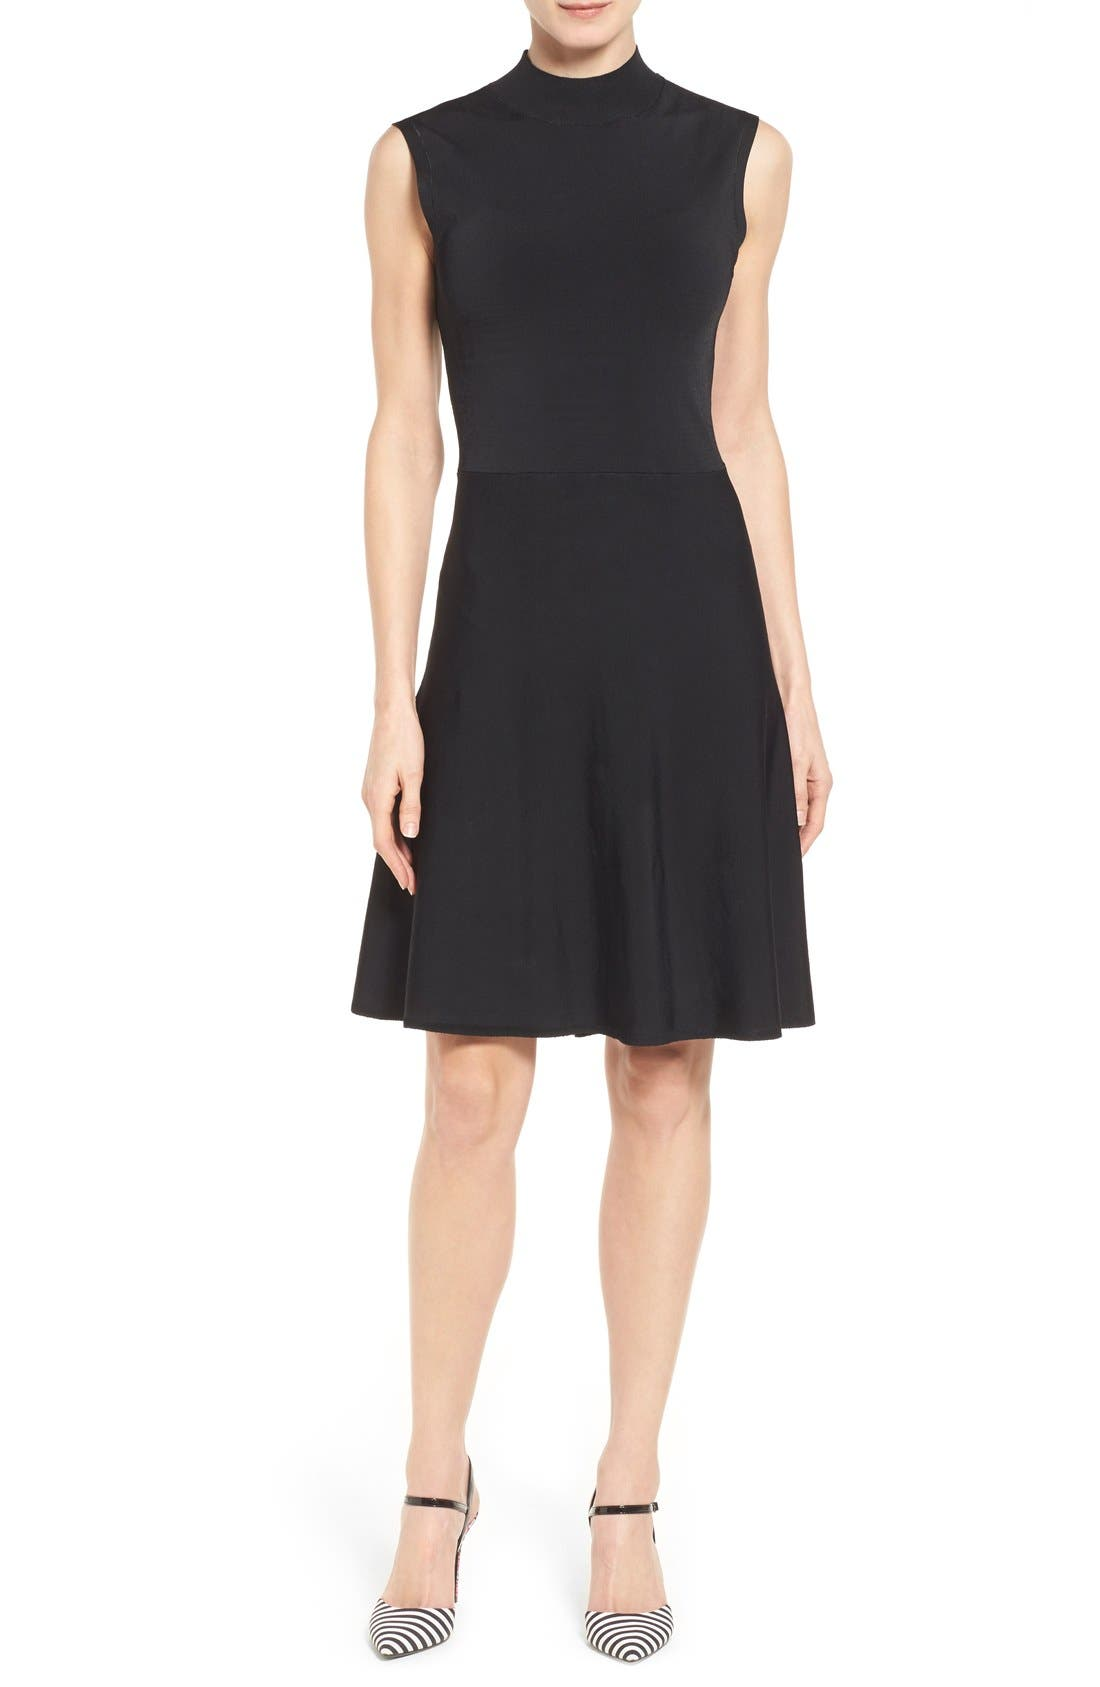 Main Image - Halogen® Mock Neck A-Line Dress (Regular & Petite)